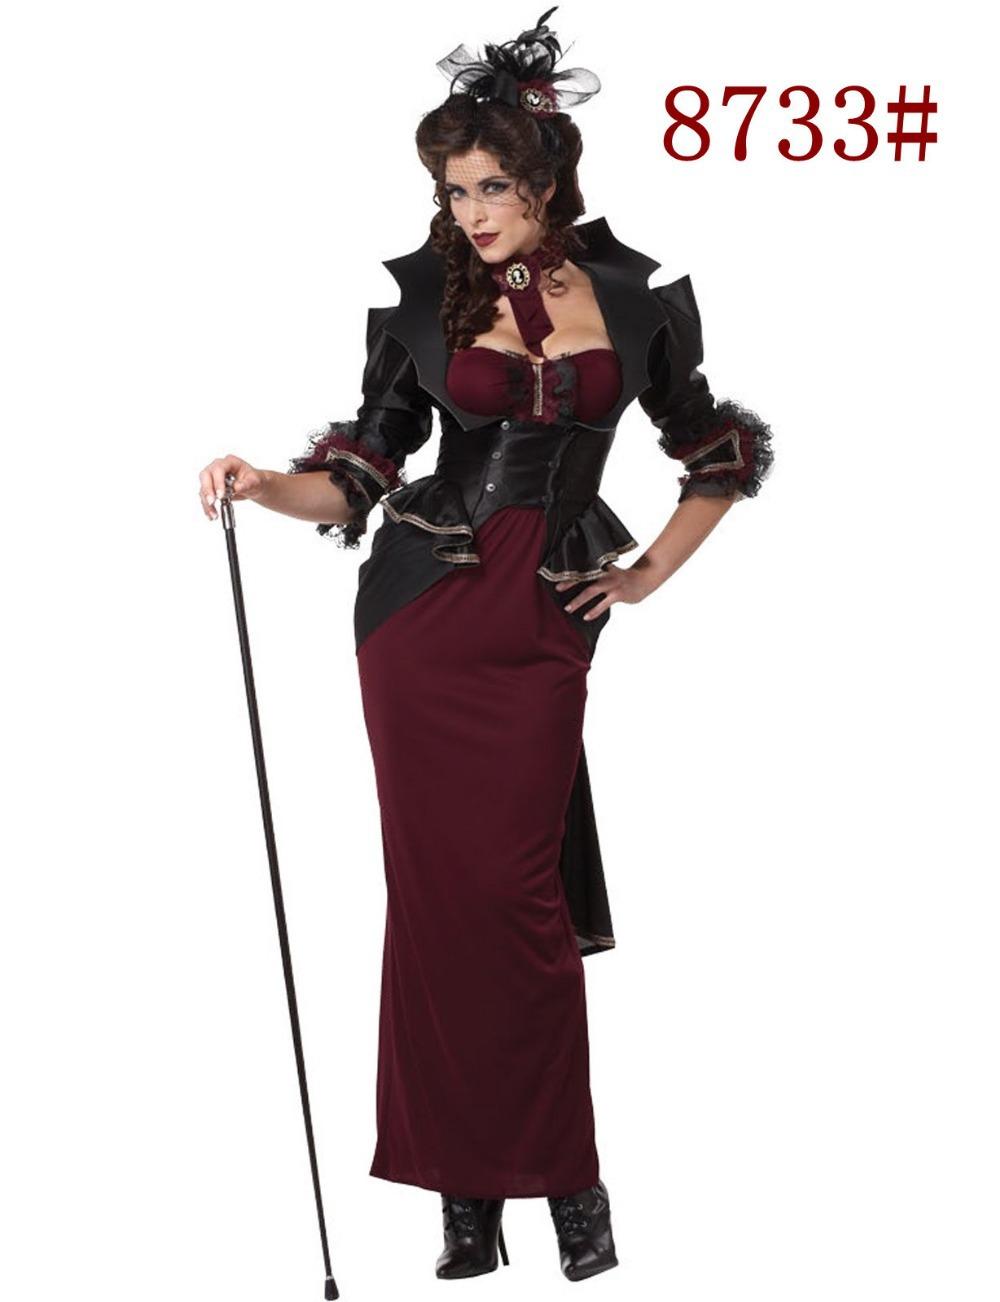 Batman Halloween Costume For Women Costume Women Halloween